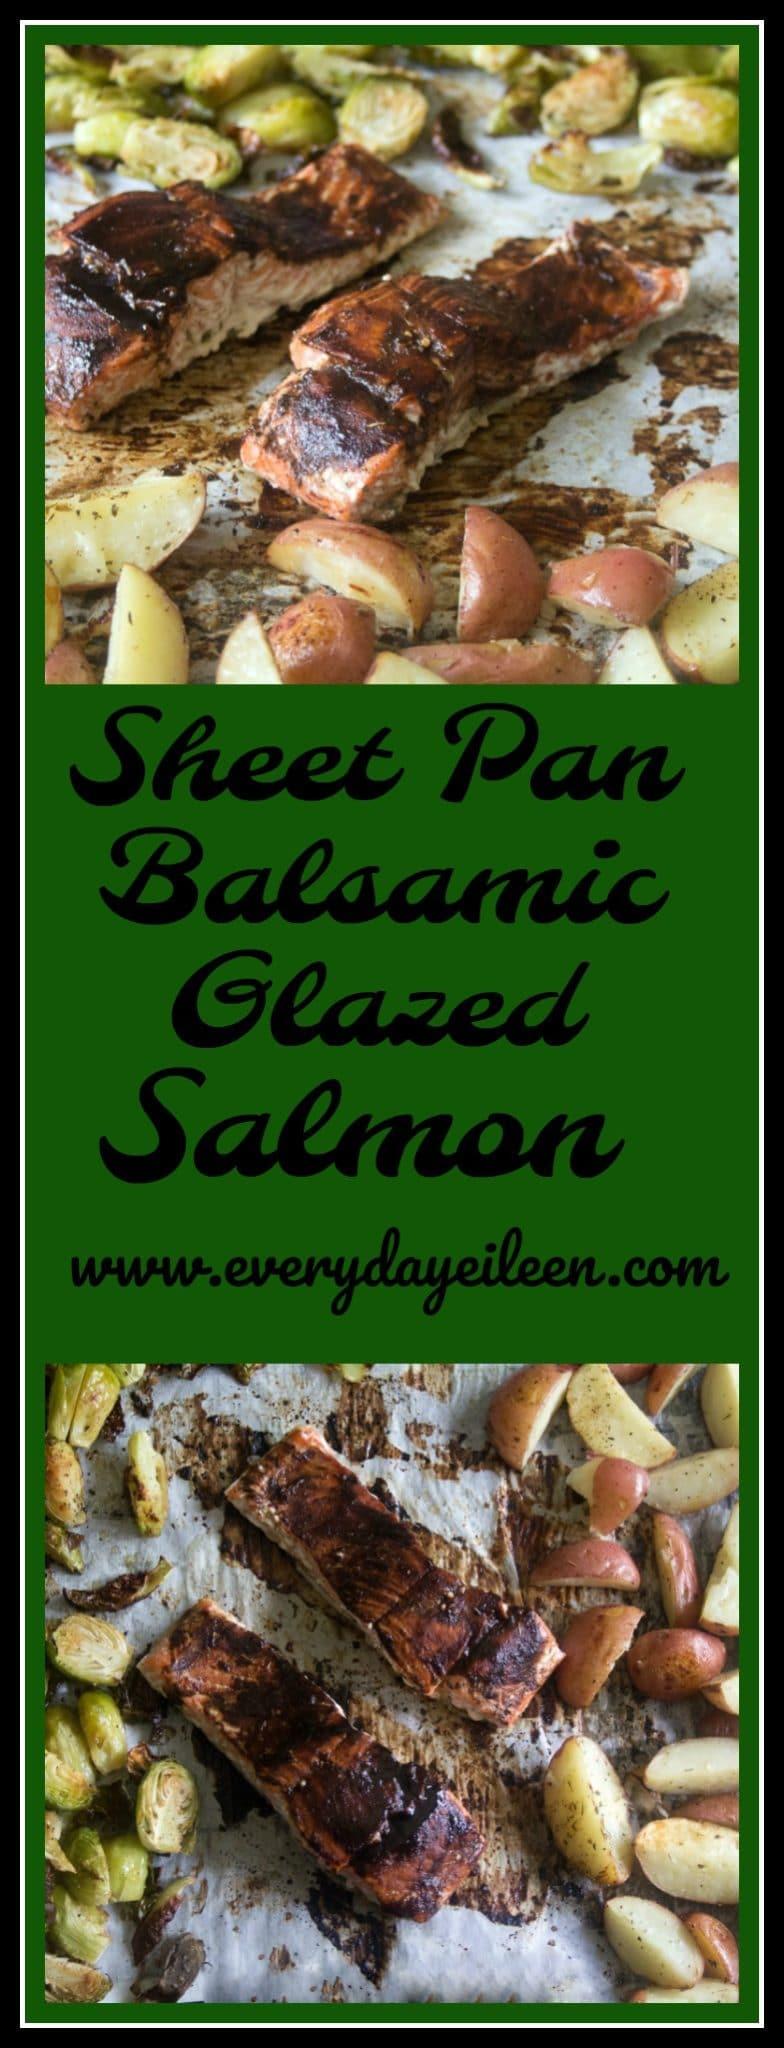 sheet pan balsamic glazed salmon